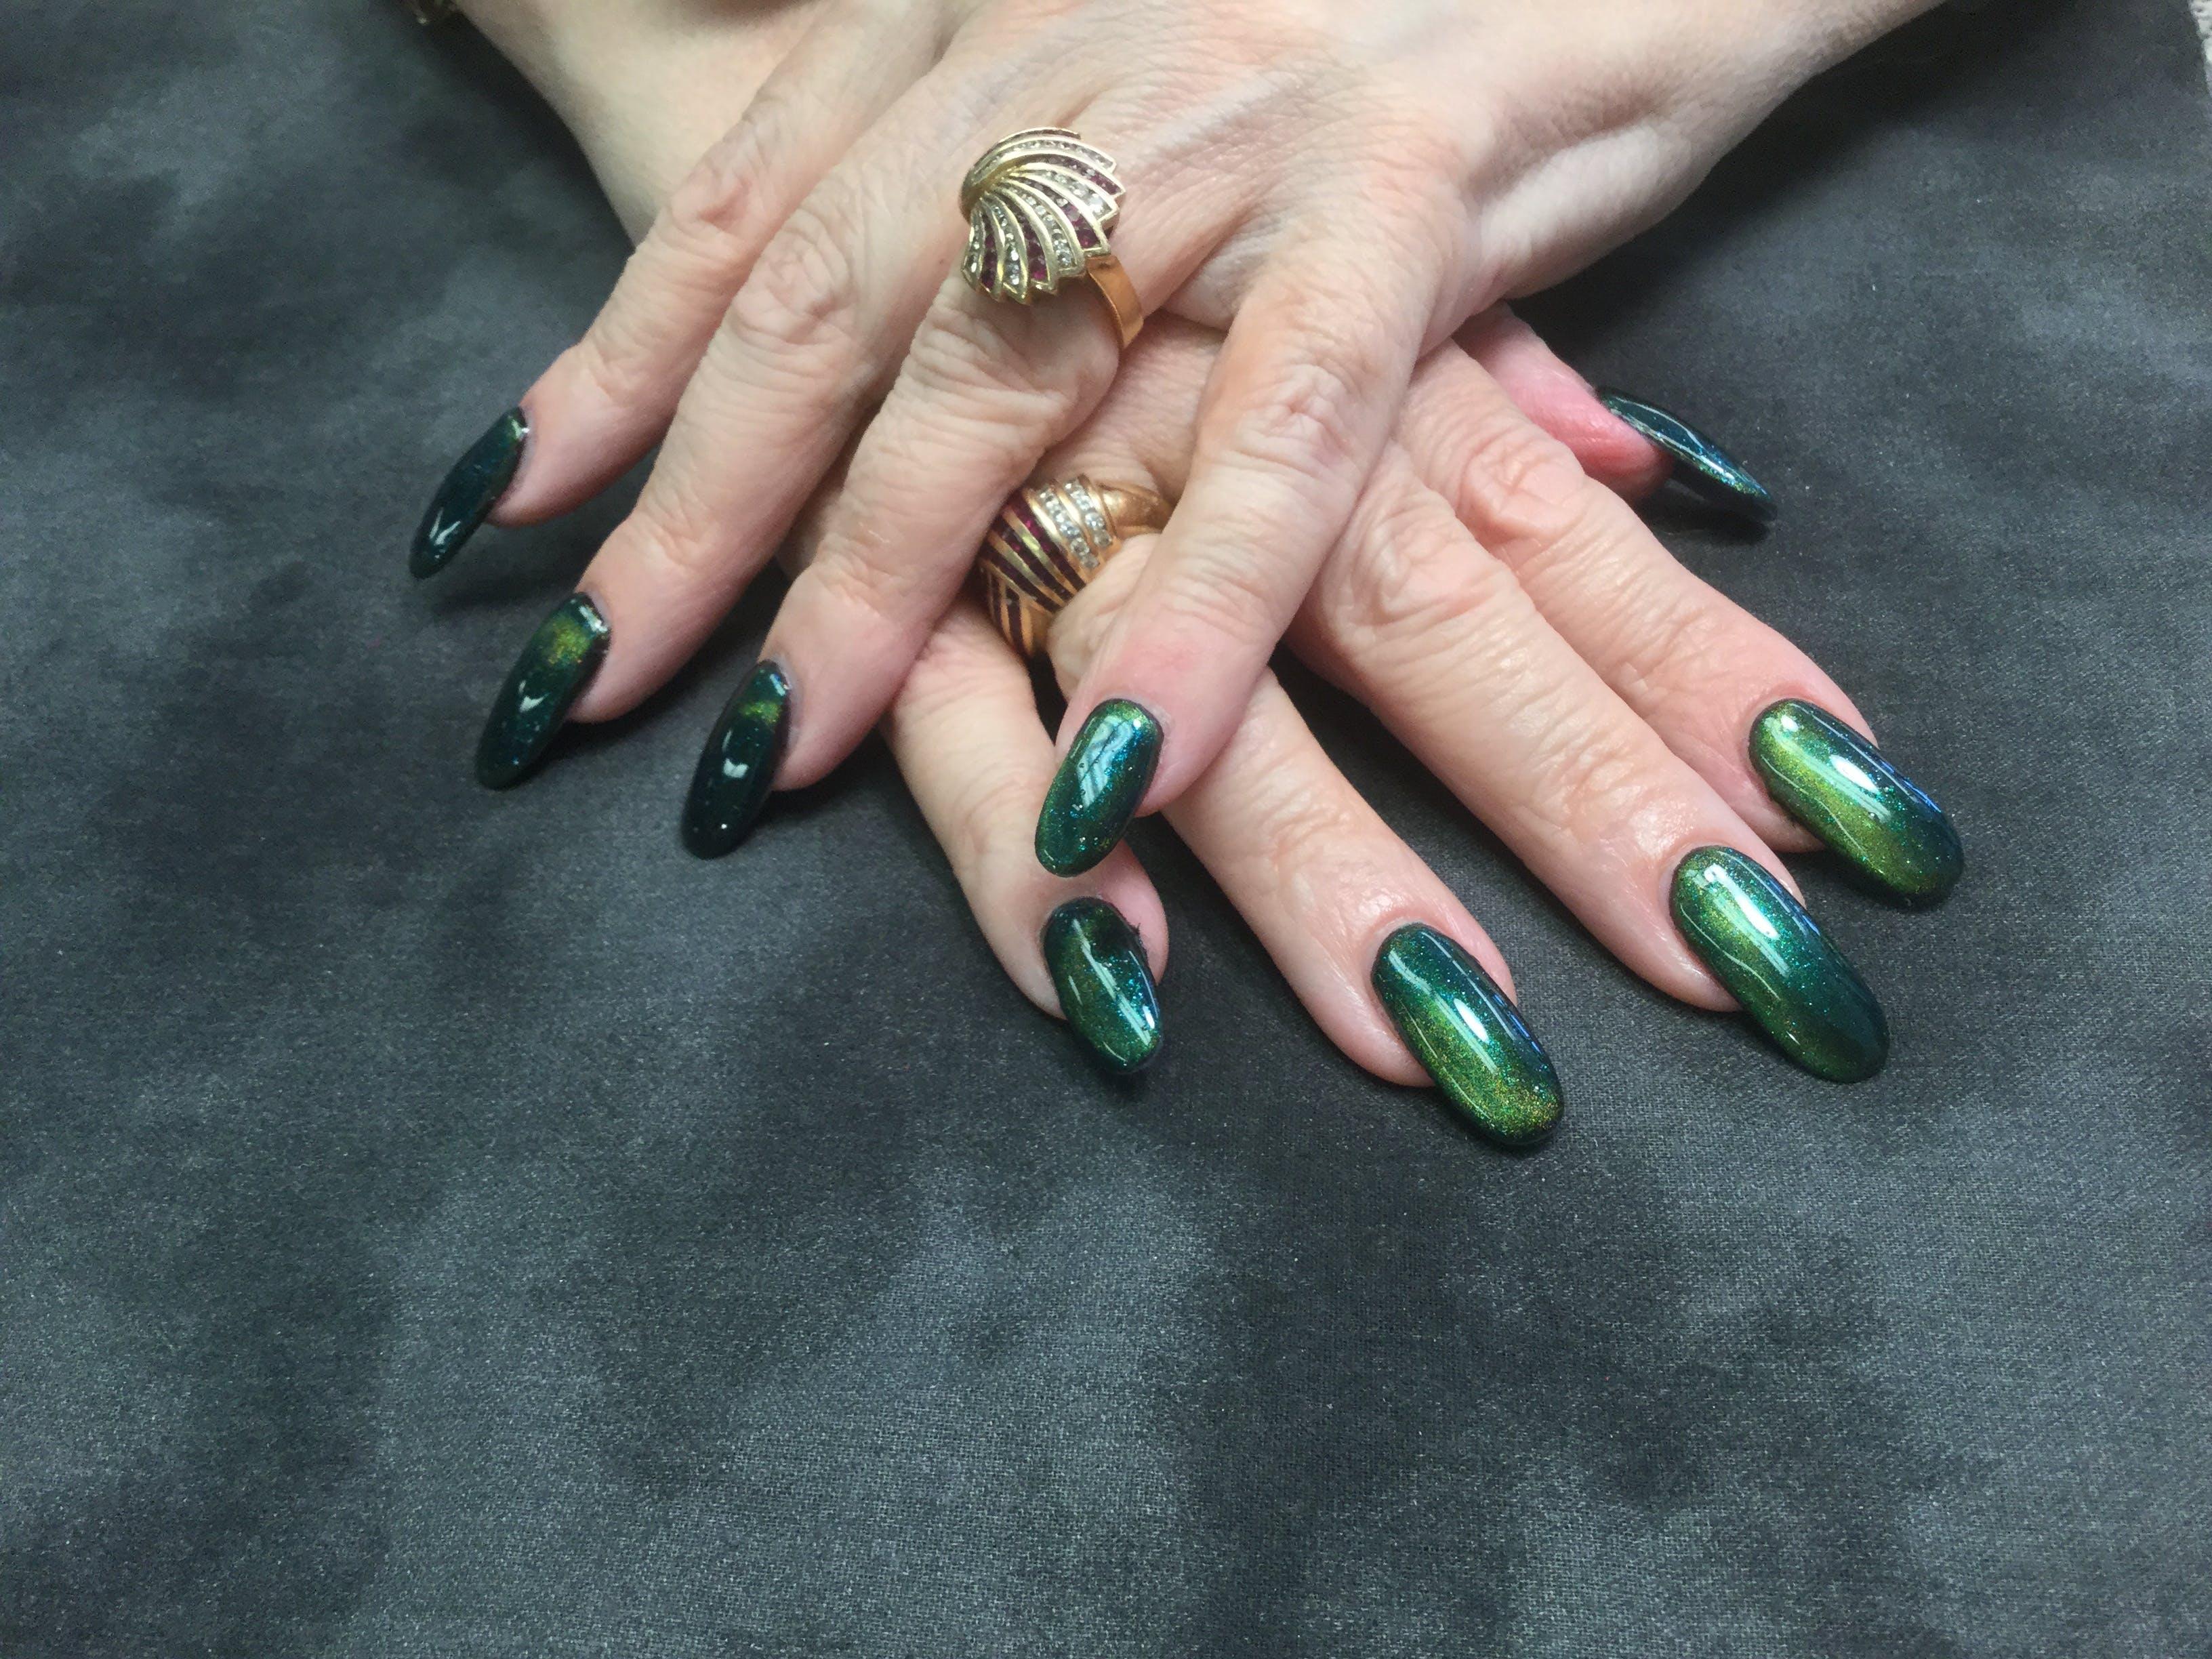 Free stock photo of Halo nails green blue nails